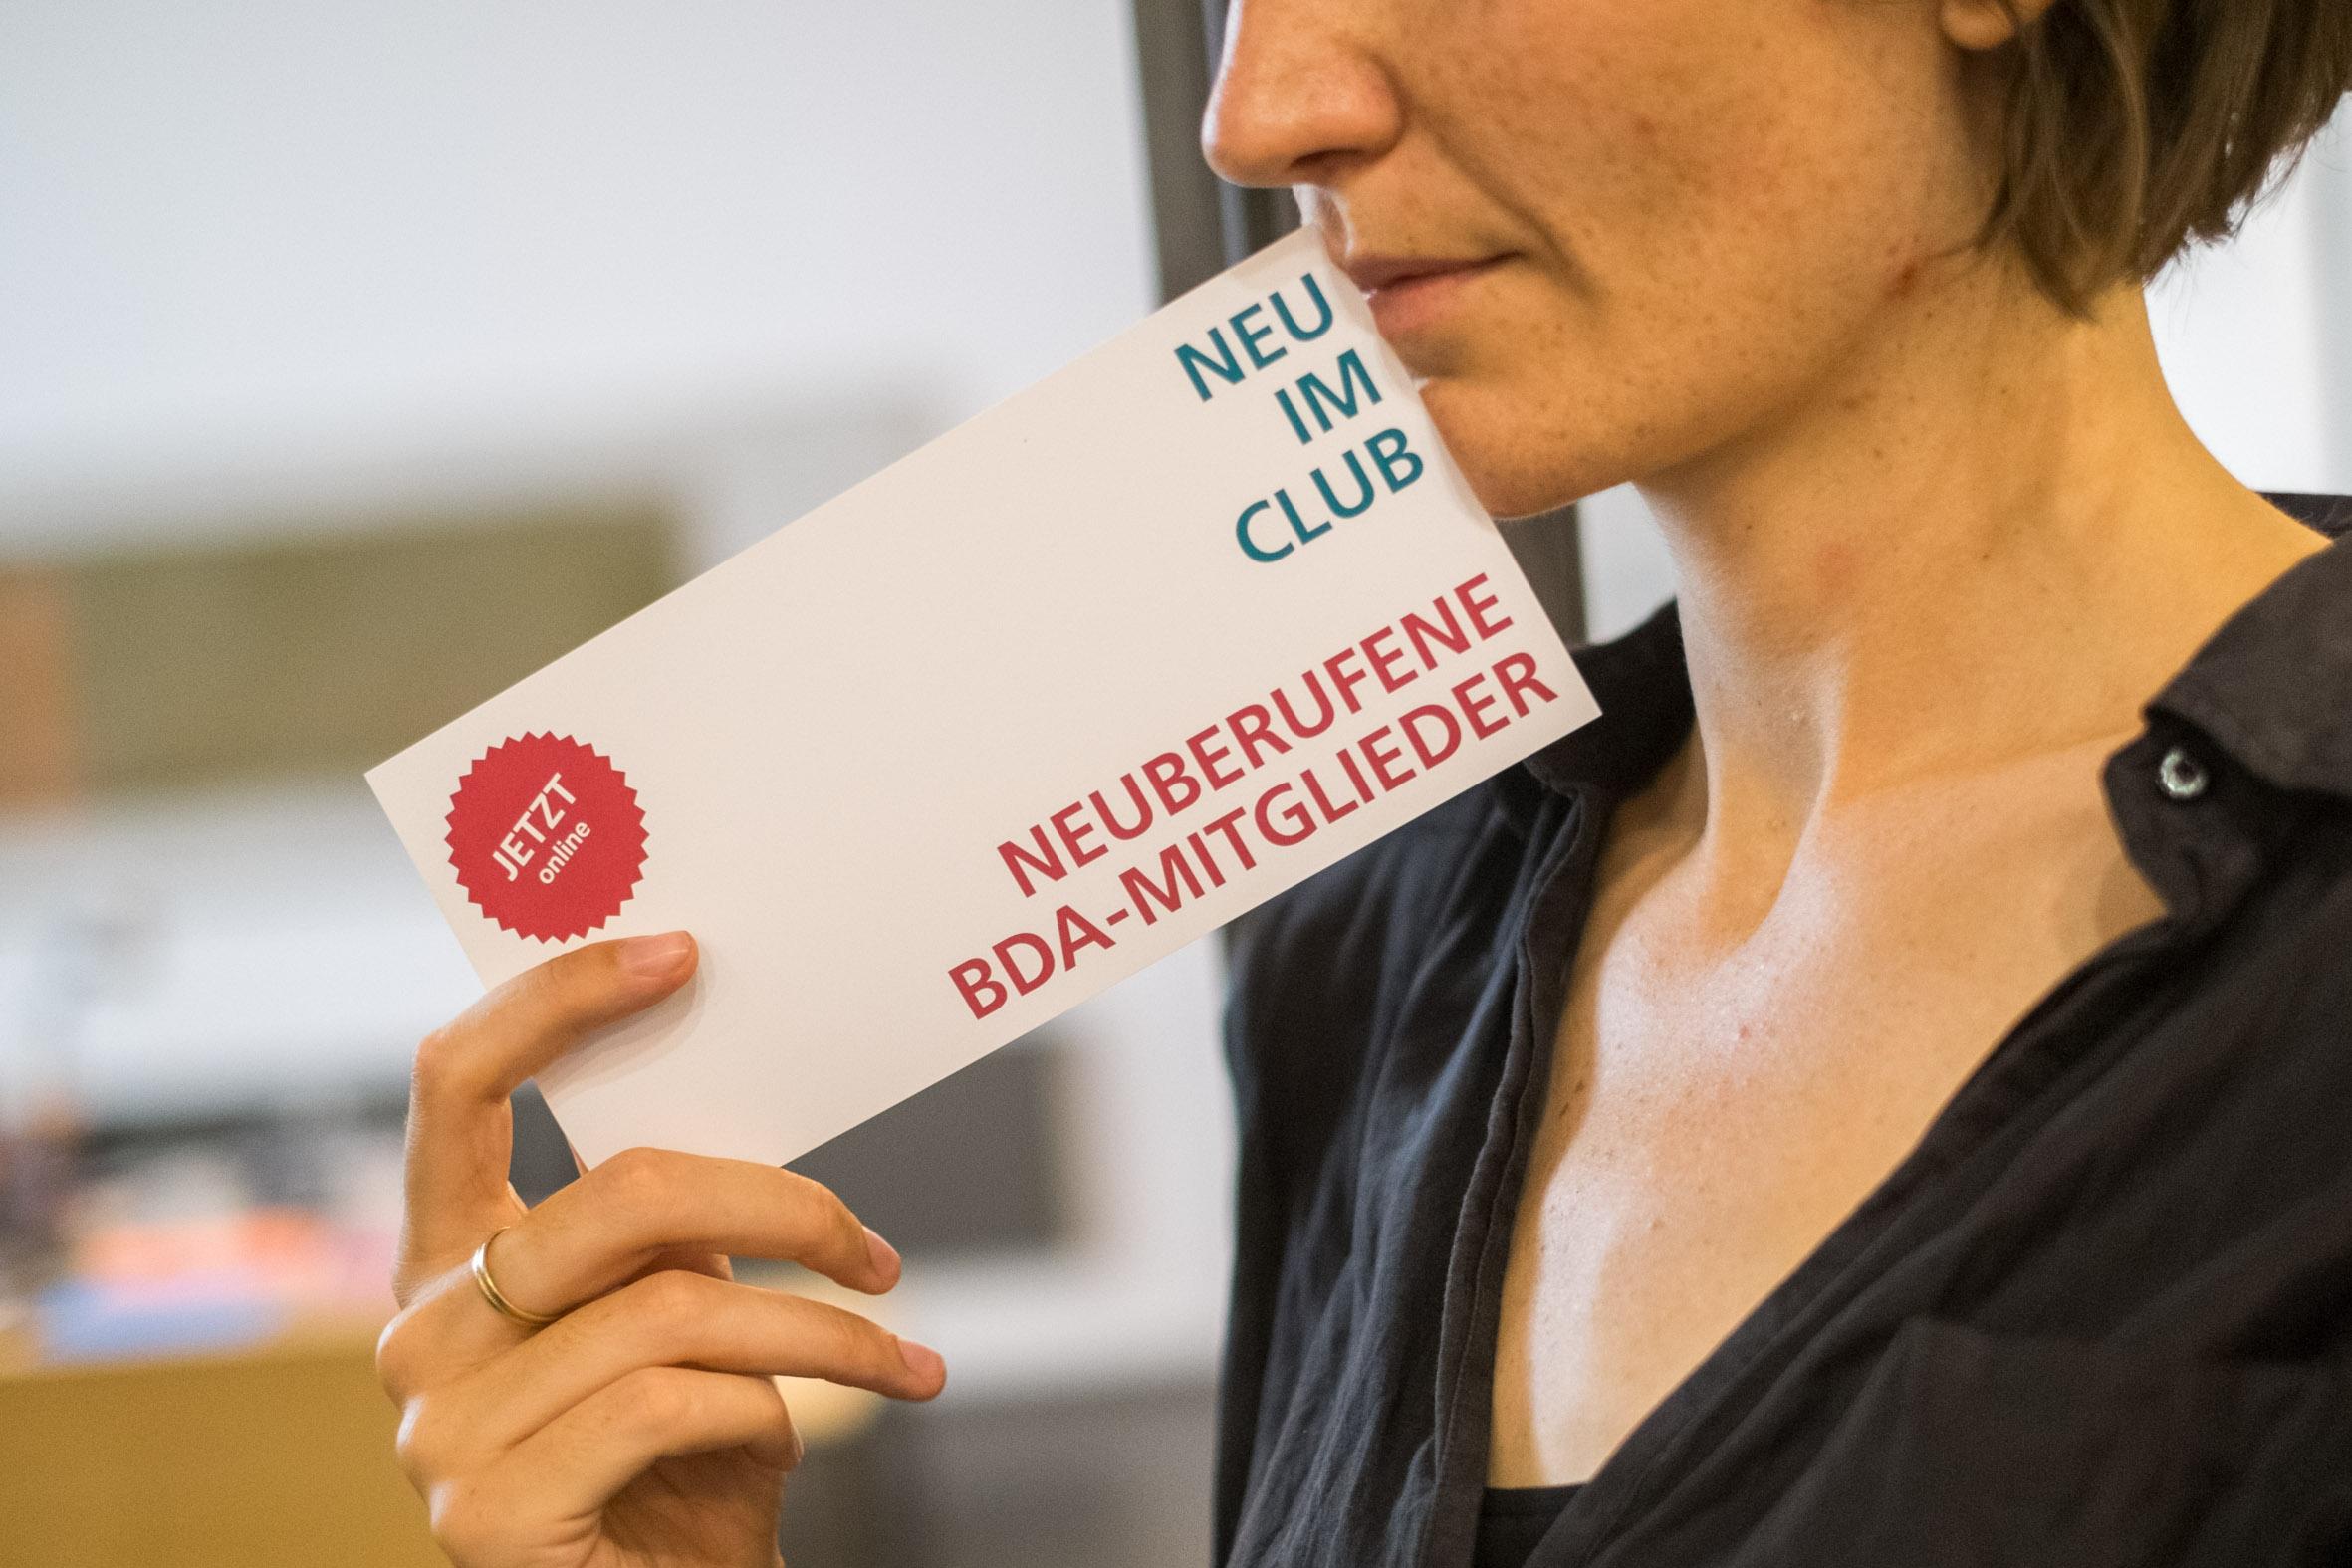 neu im club 4/16: zwo/elf